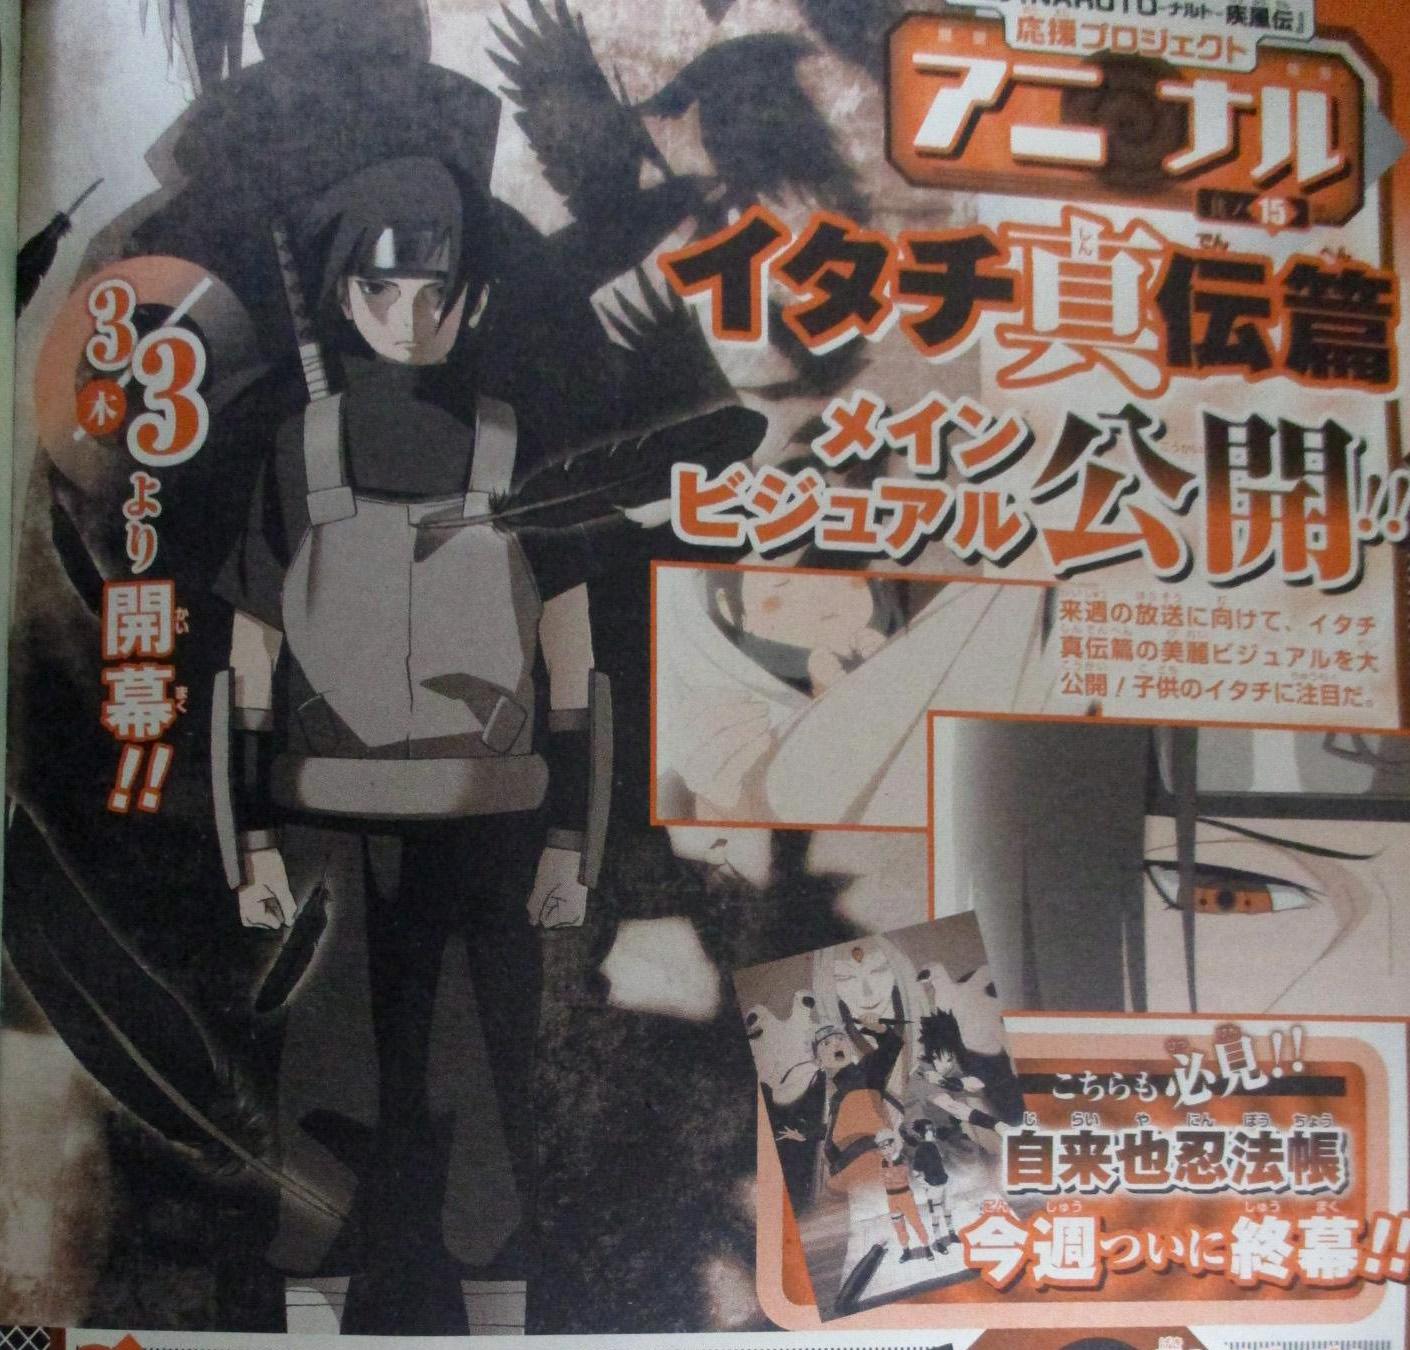 itachi-5 Naruto Shippuden: Itachi ve Shisui'nin küçüklükleri